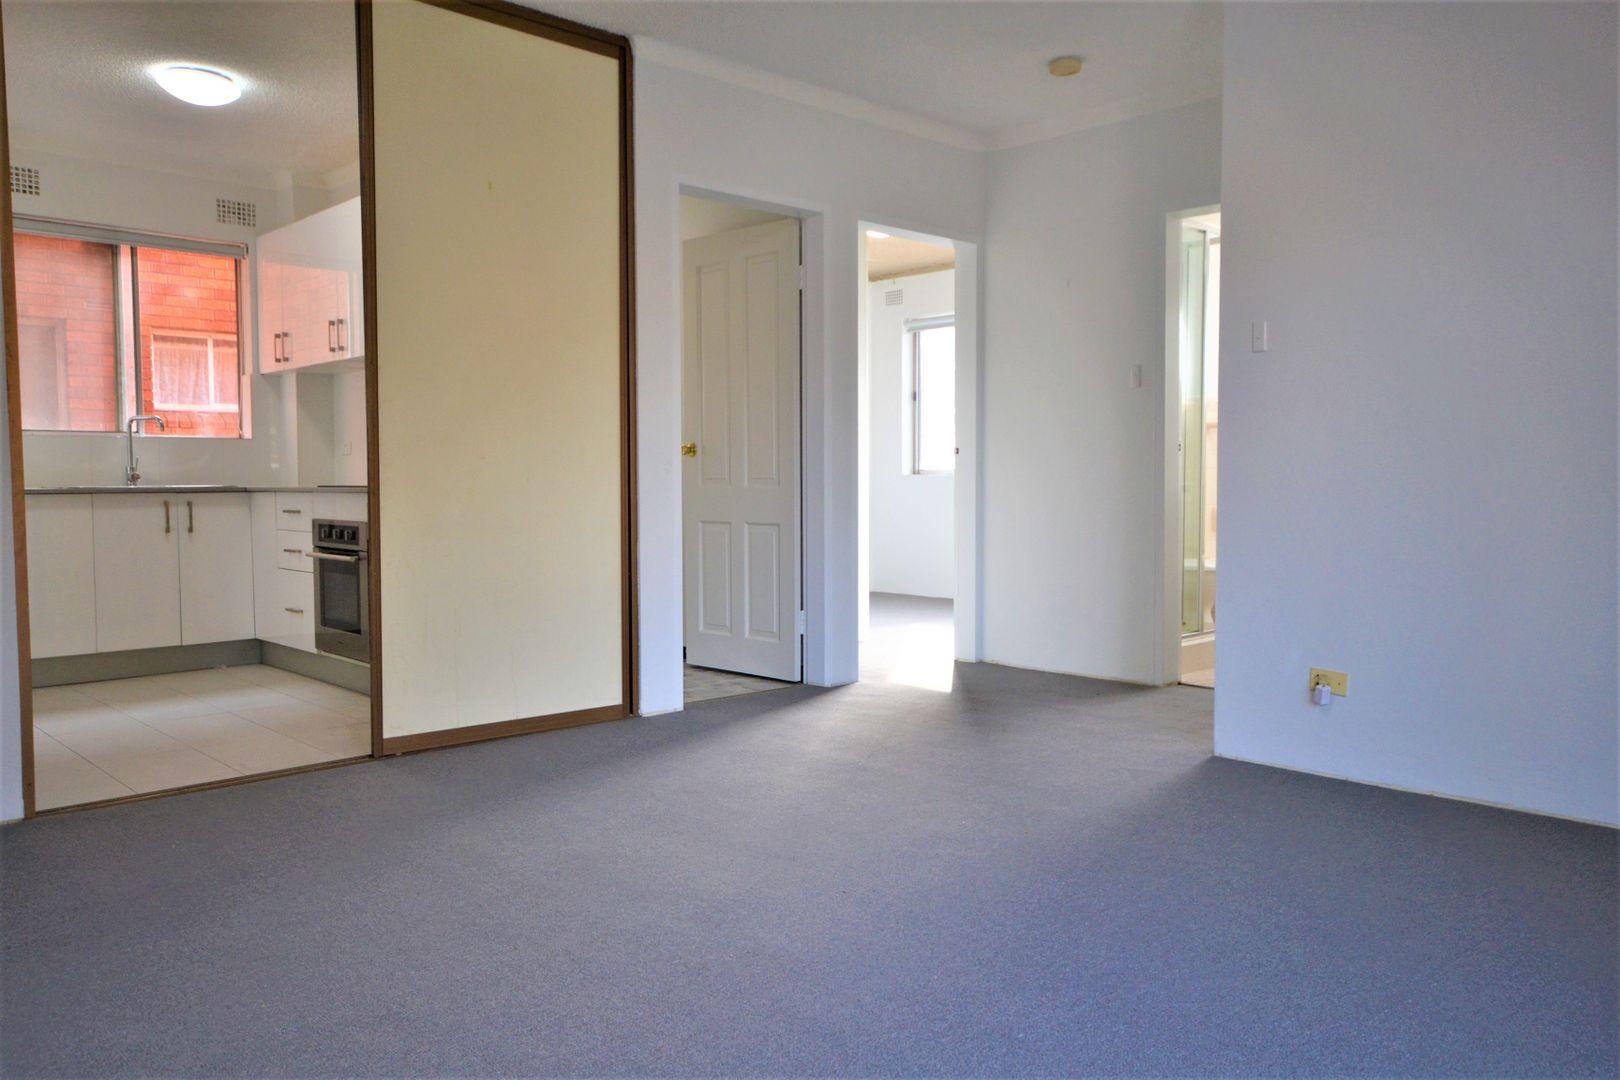 7/17 Thurlow Street, Riverwood NSW 2210, Image 2